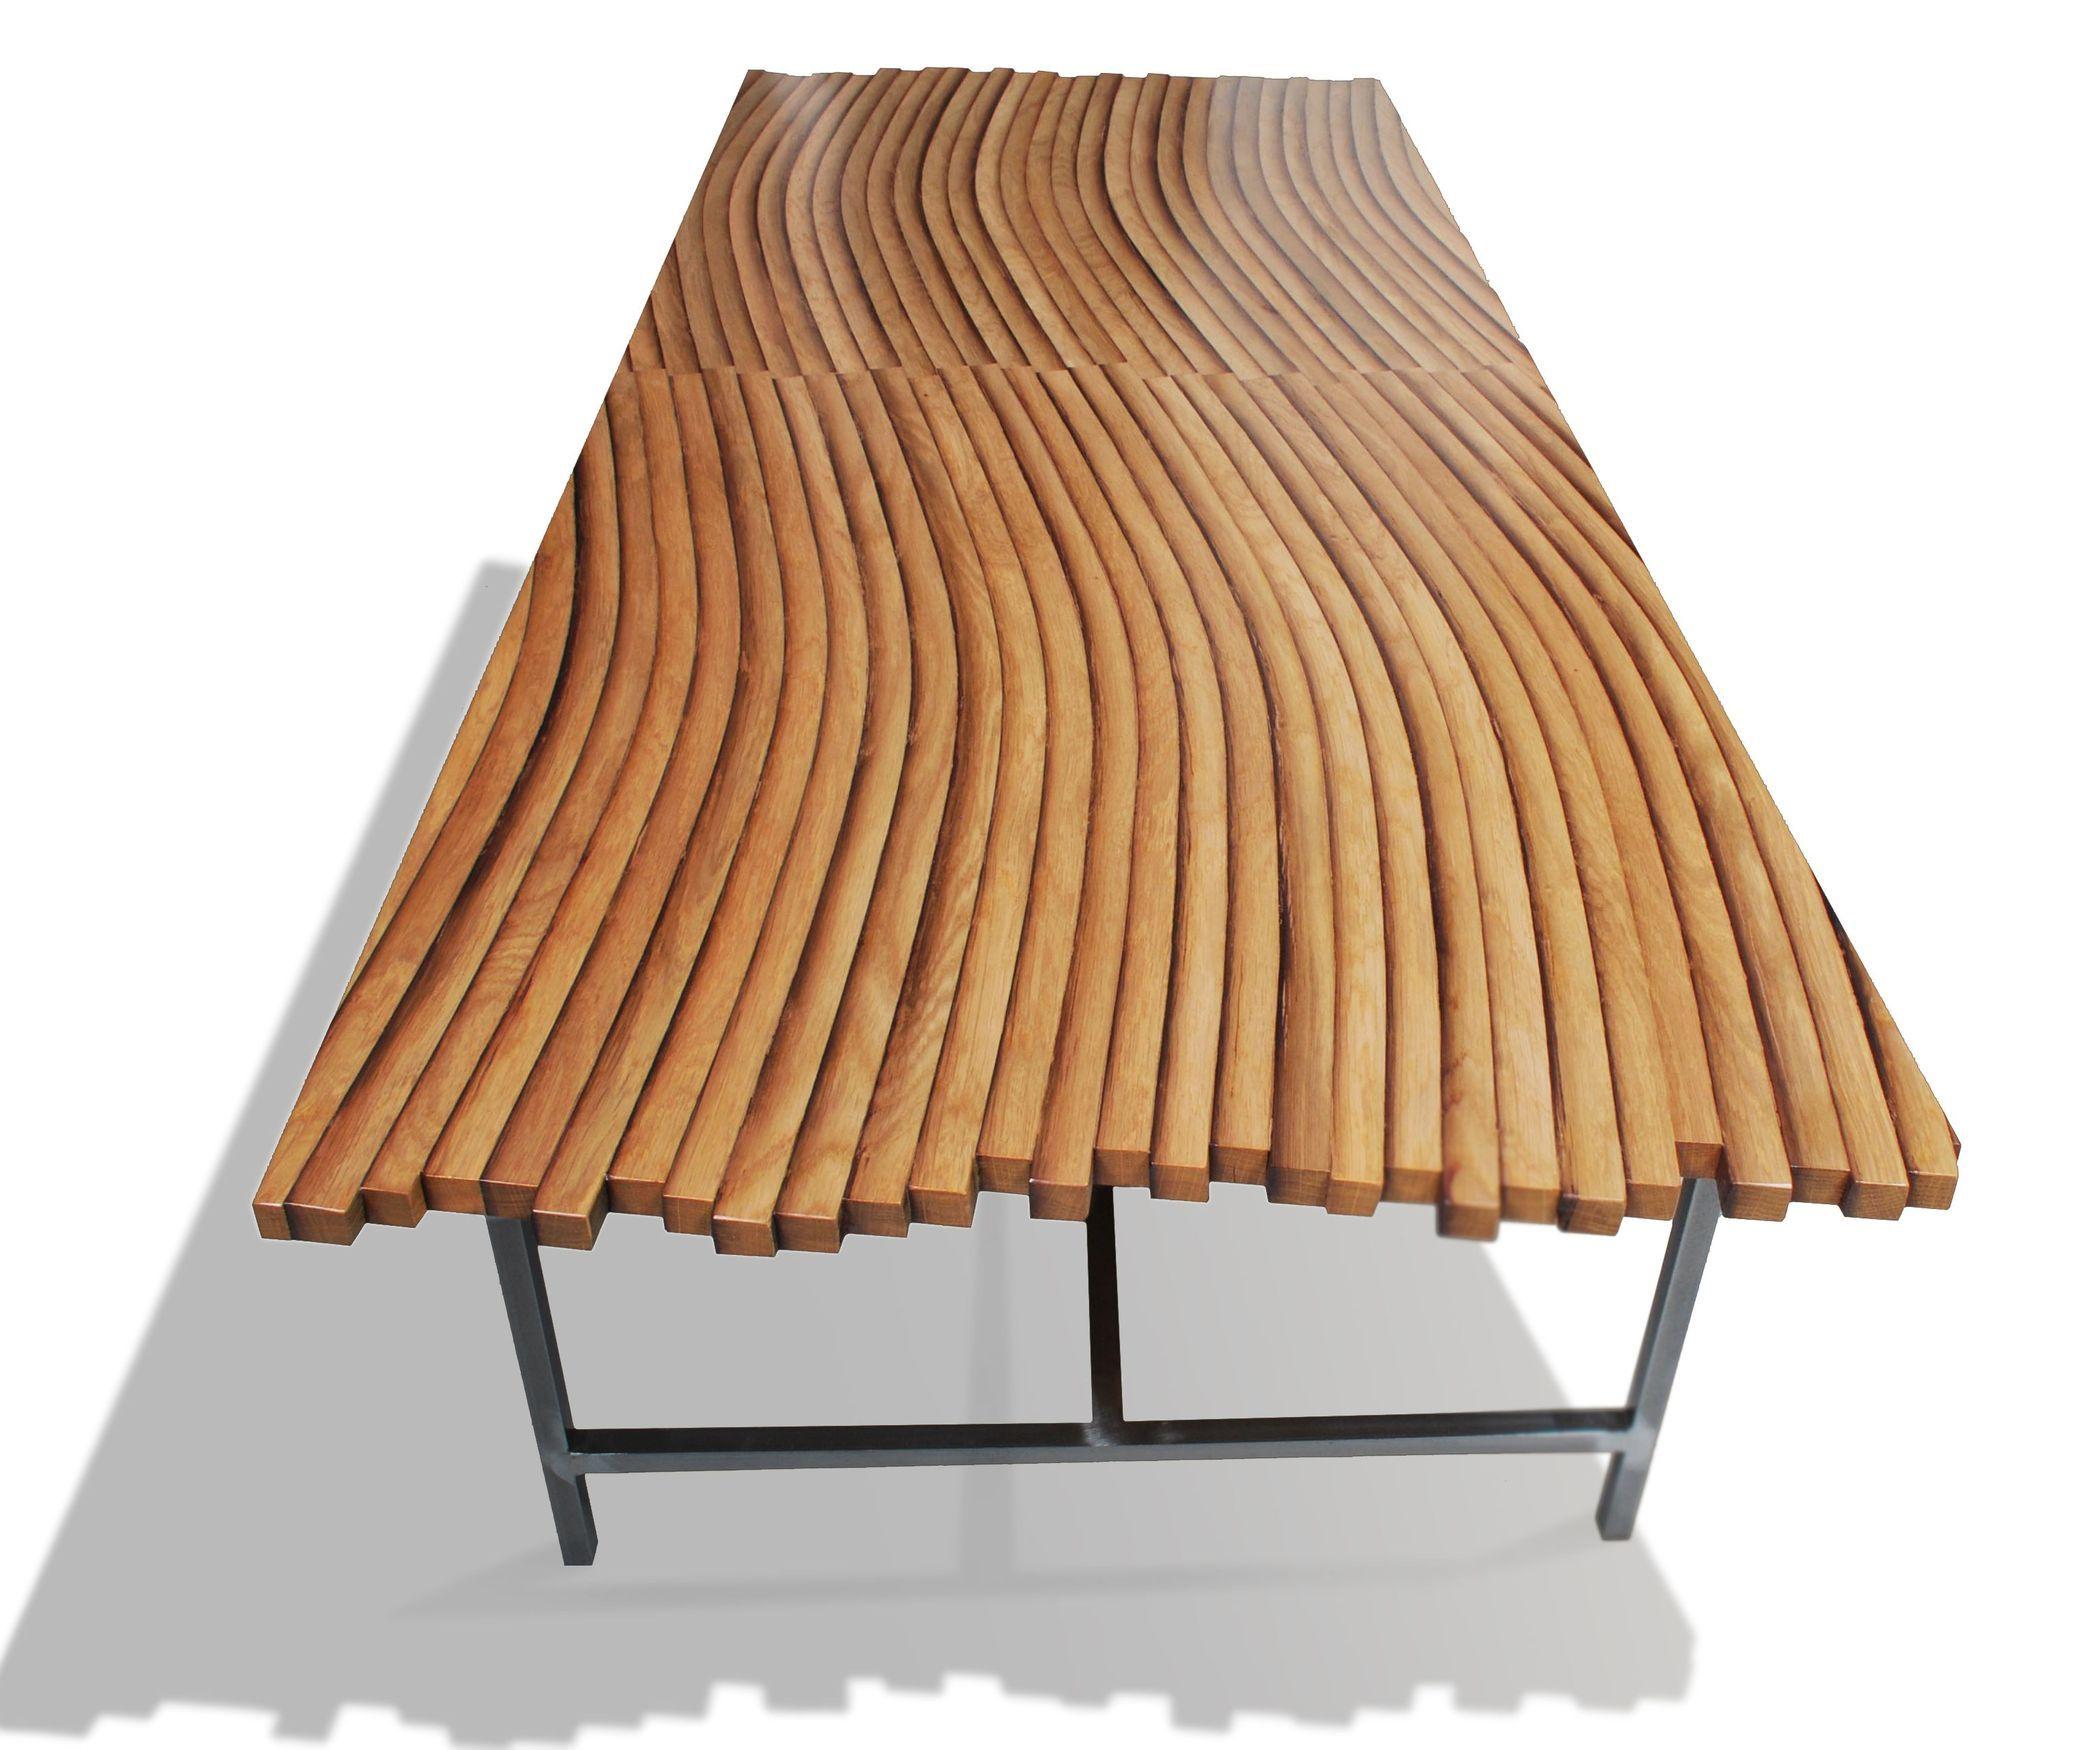 Seattle Wood Furniture Furniture Design Ideas. Furniture Legs Seattle   Interior Design